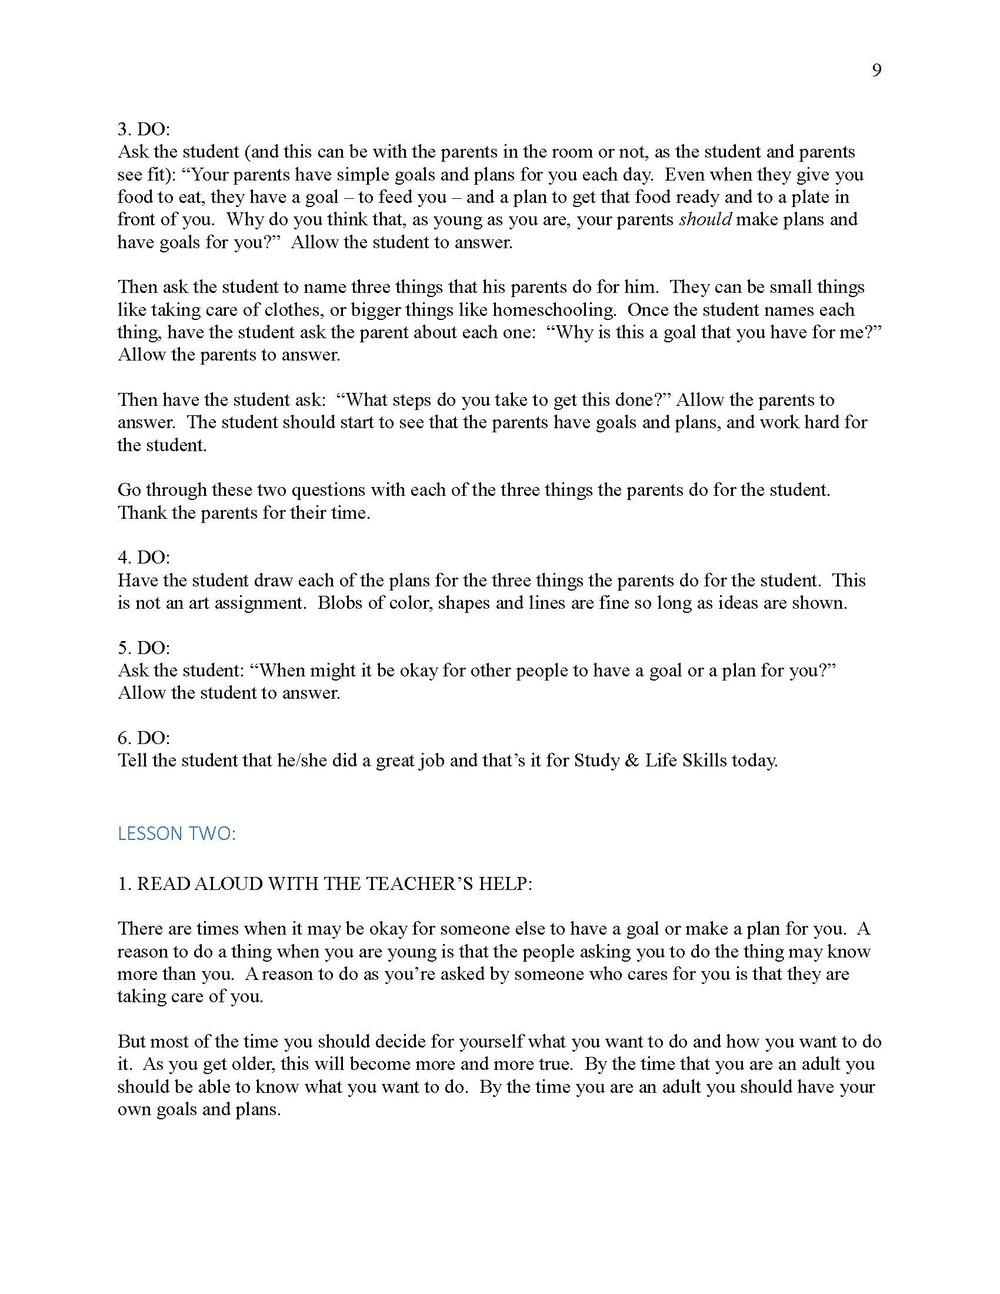 Step 1 Study & Life Skills 6 - Doing Plans_Page_10.jpg